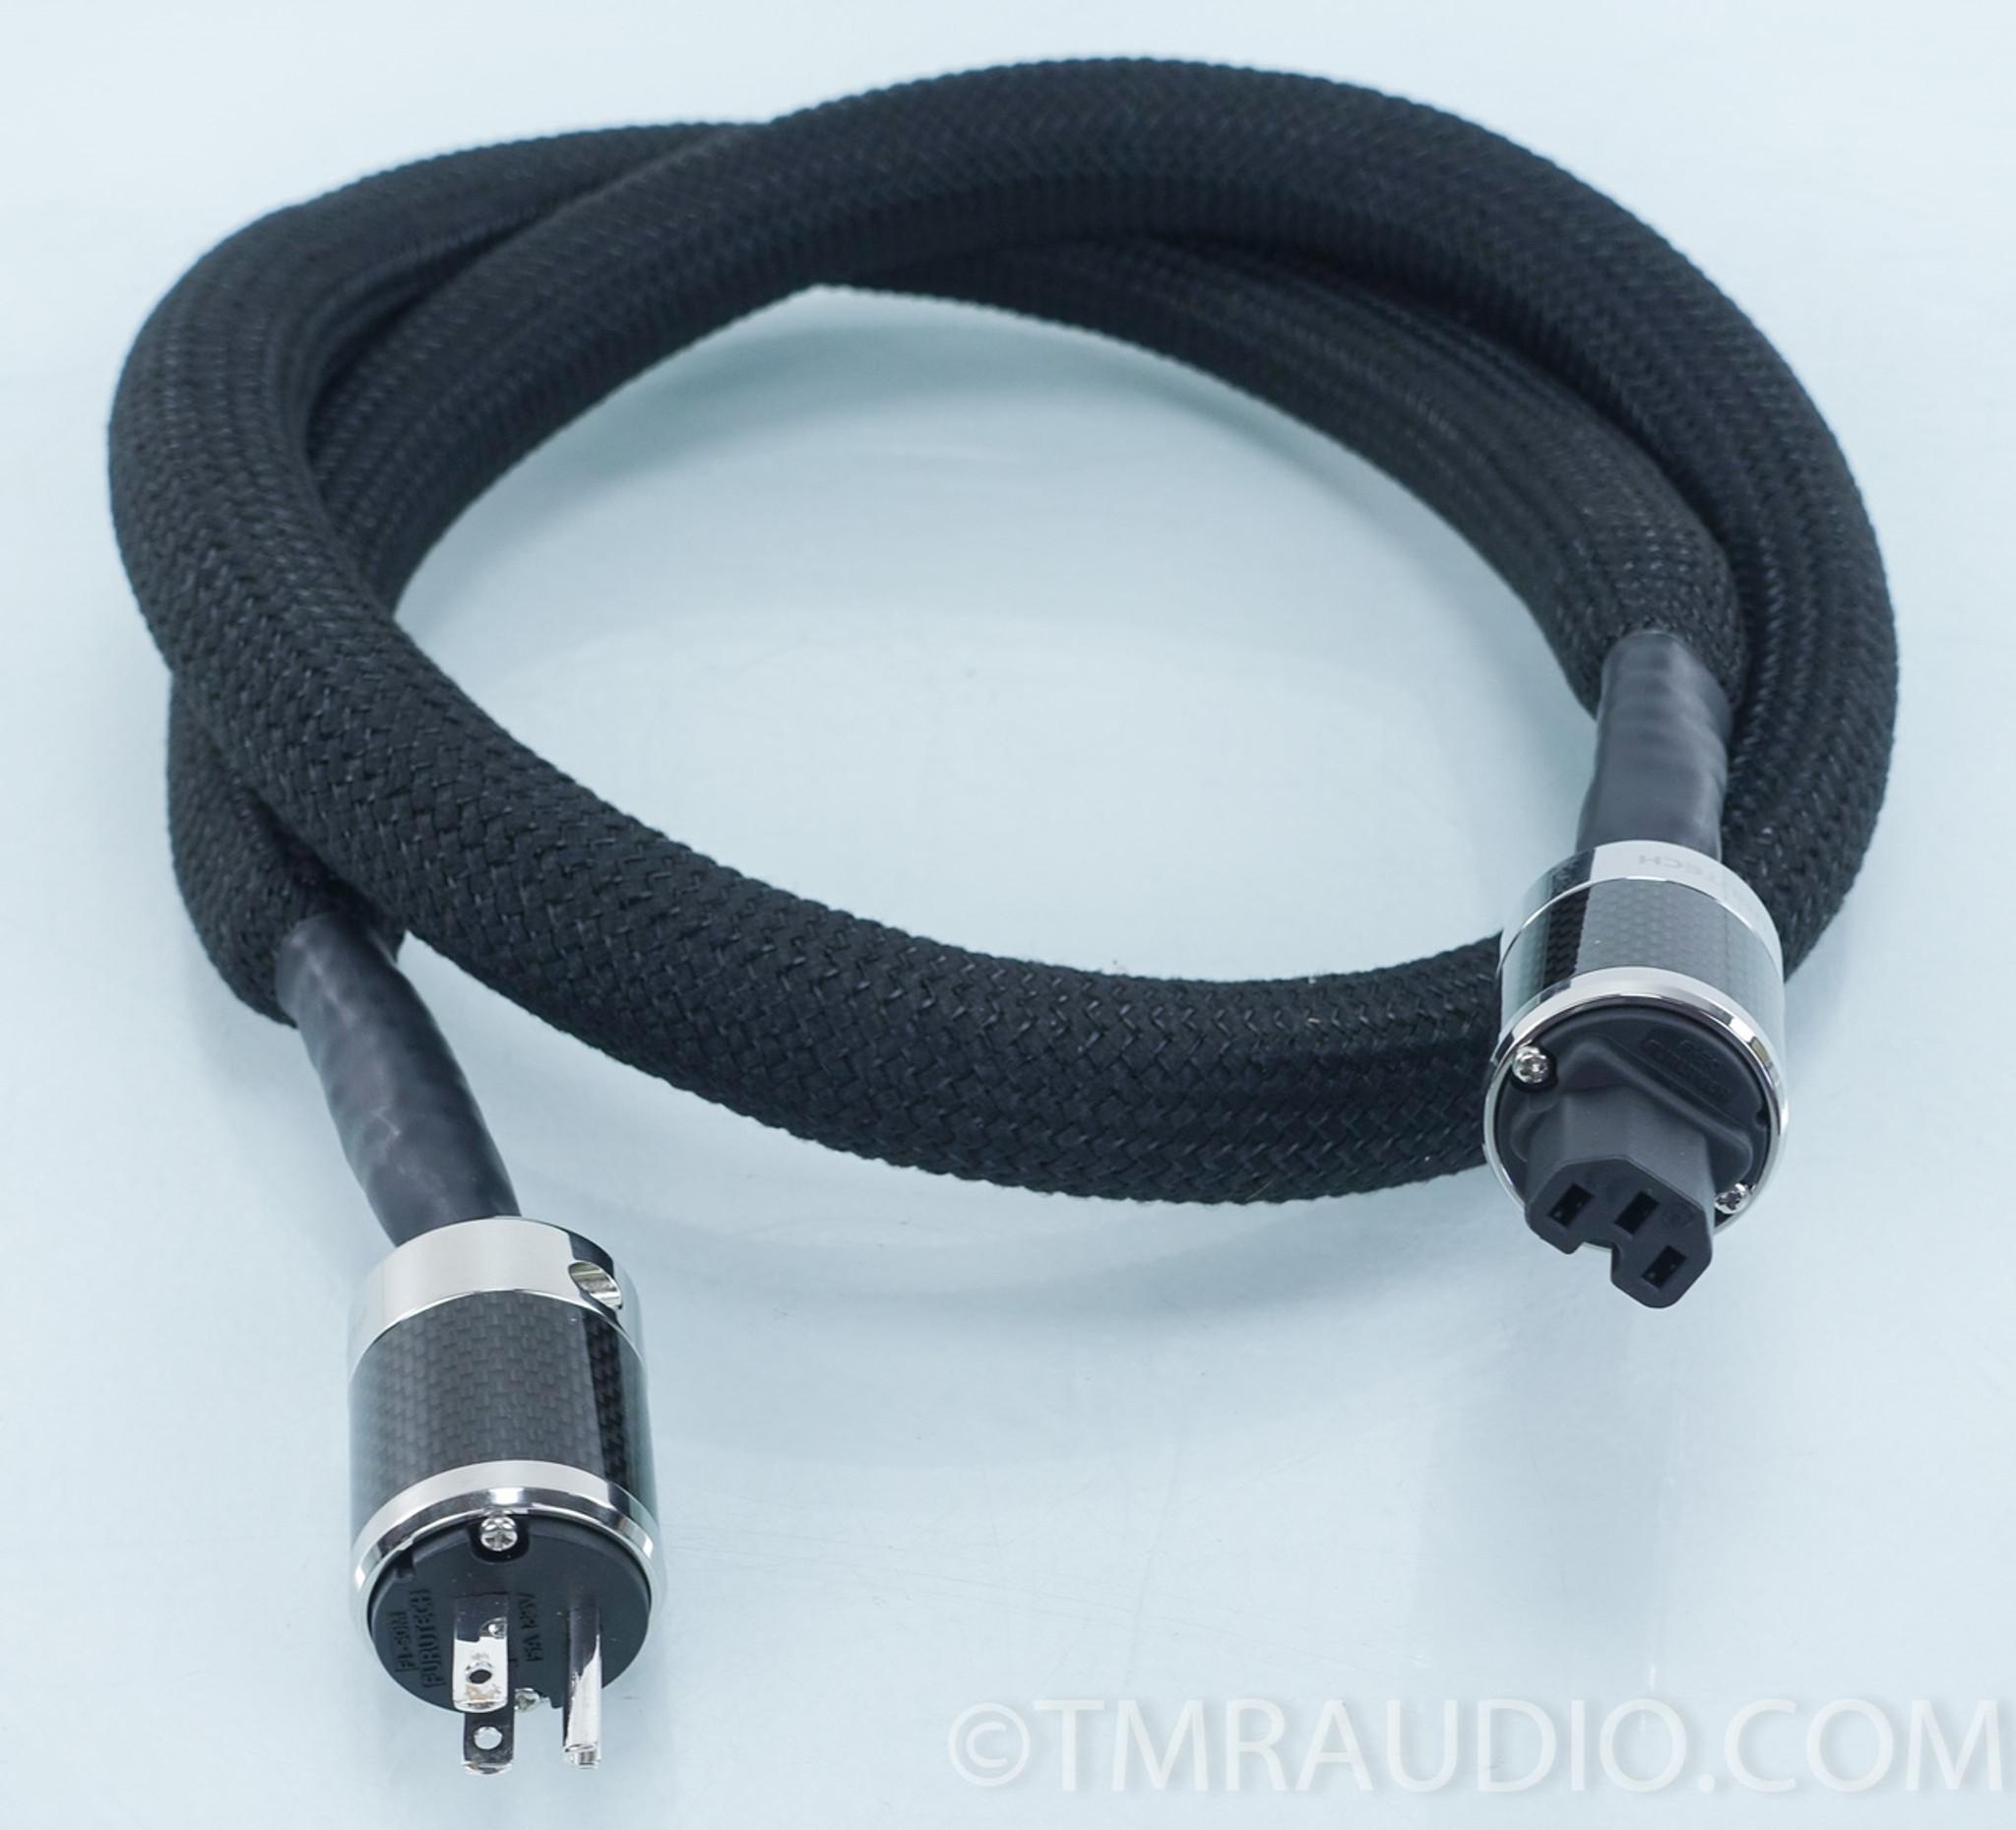 Core Audio Technologies Kenai Power Cable